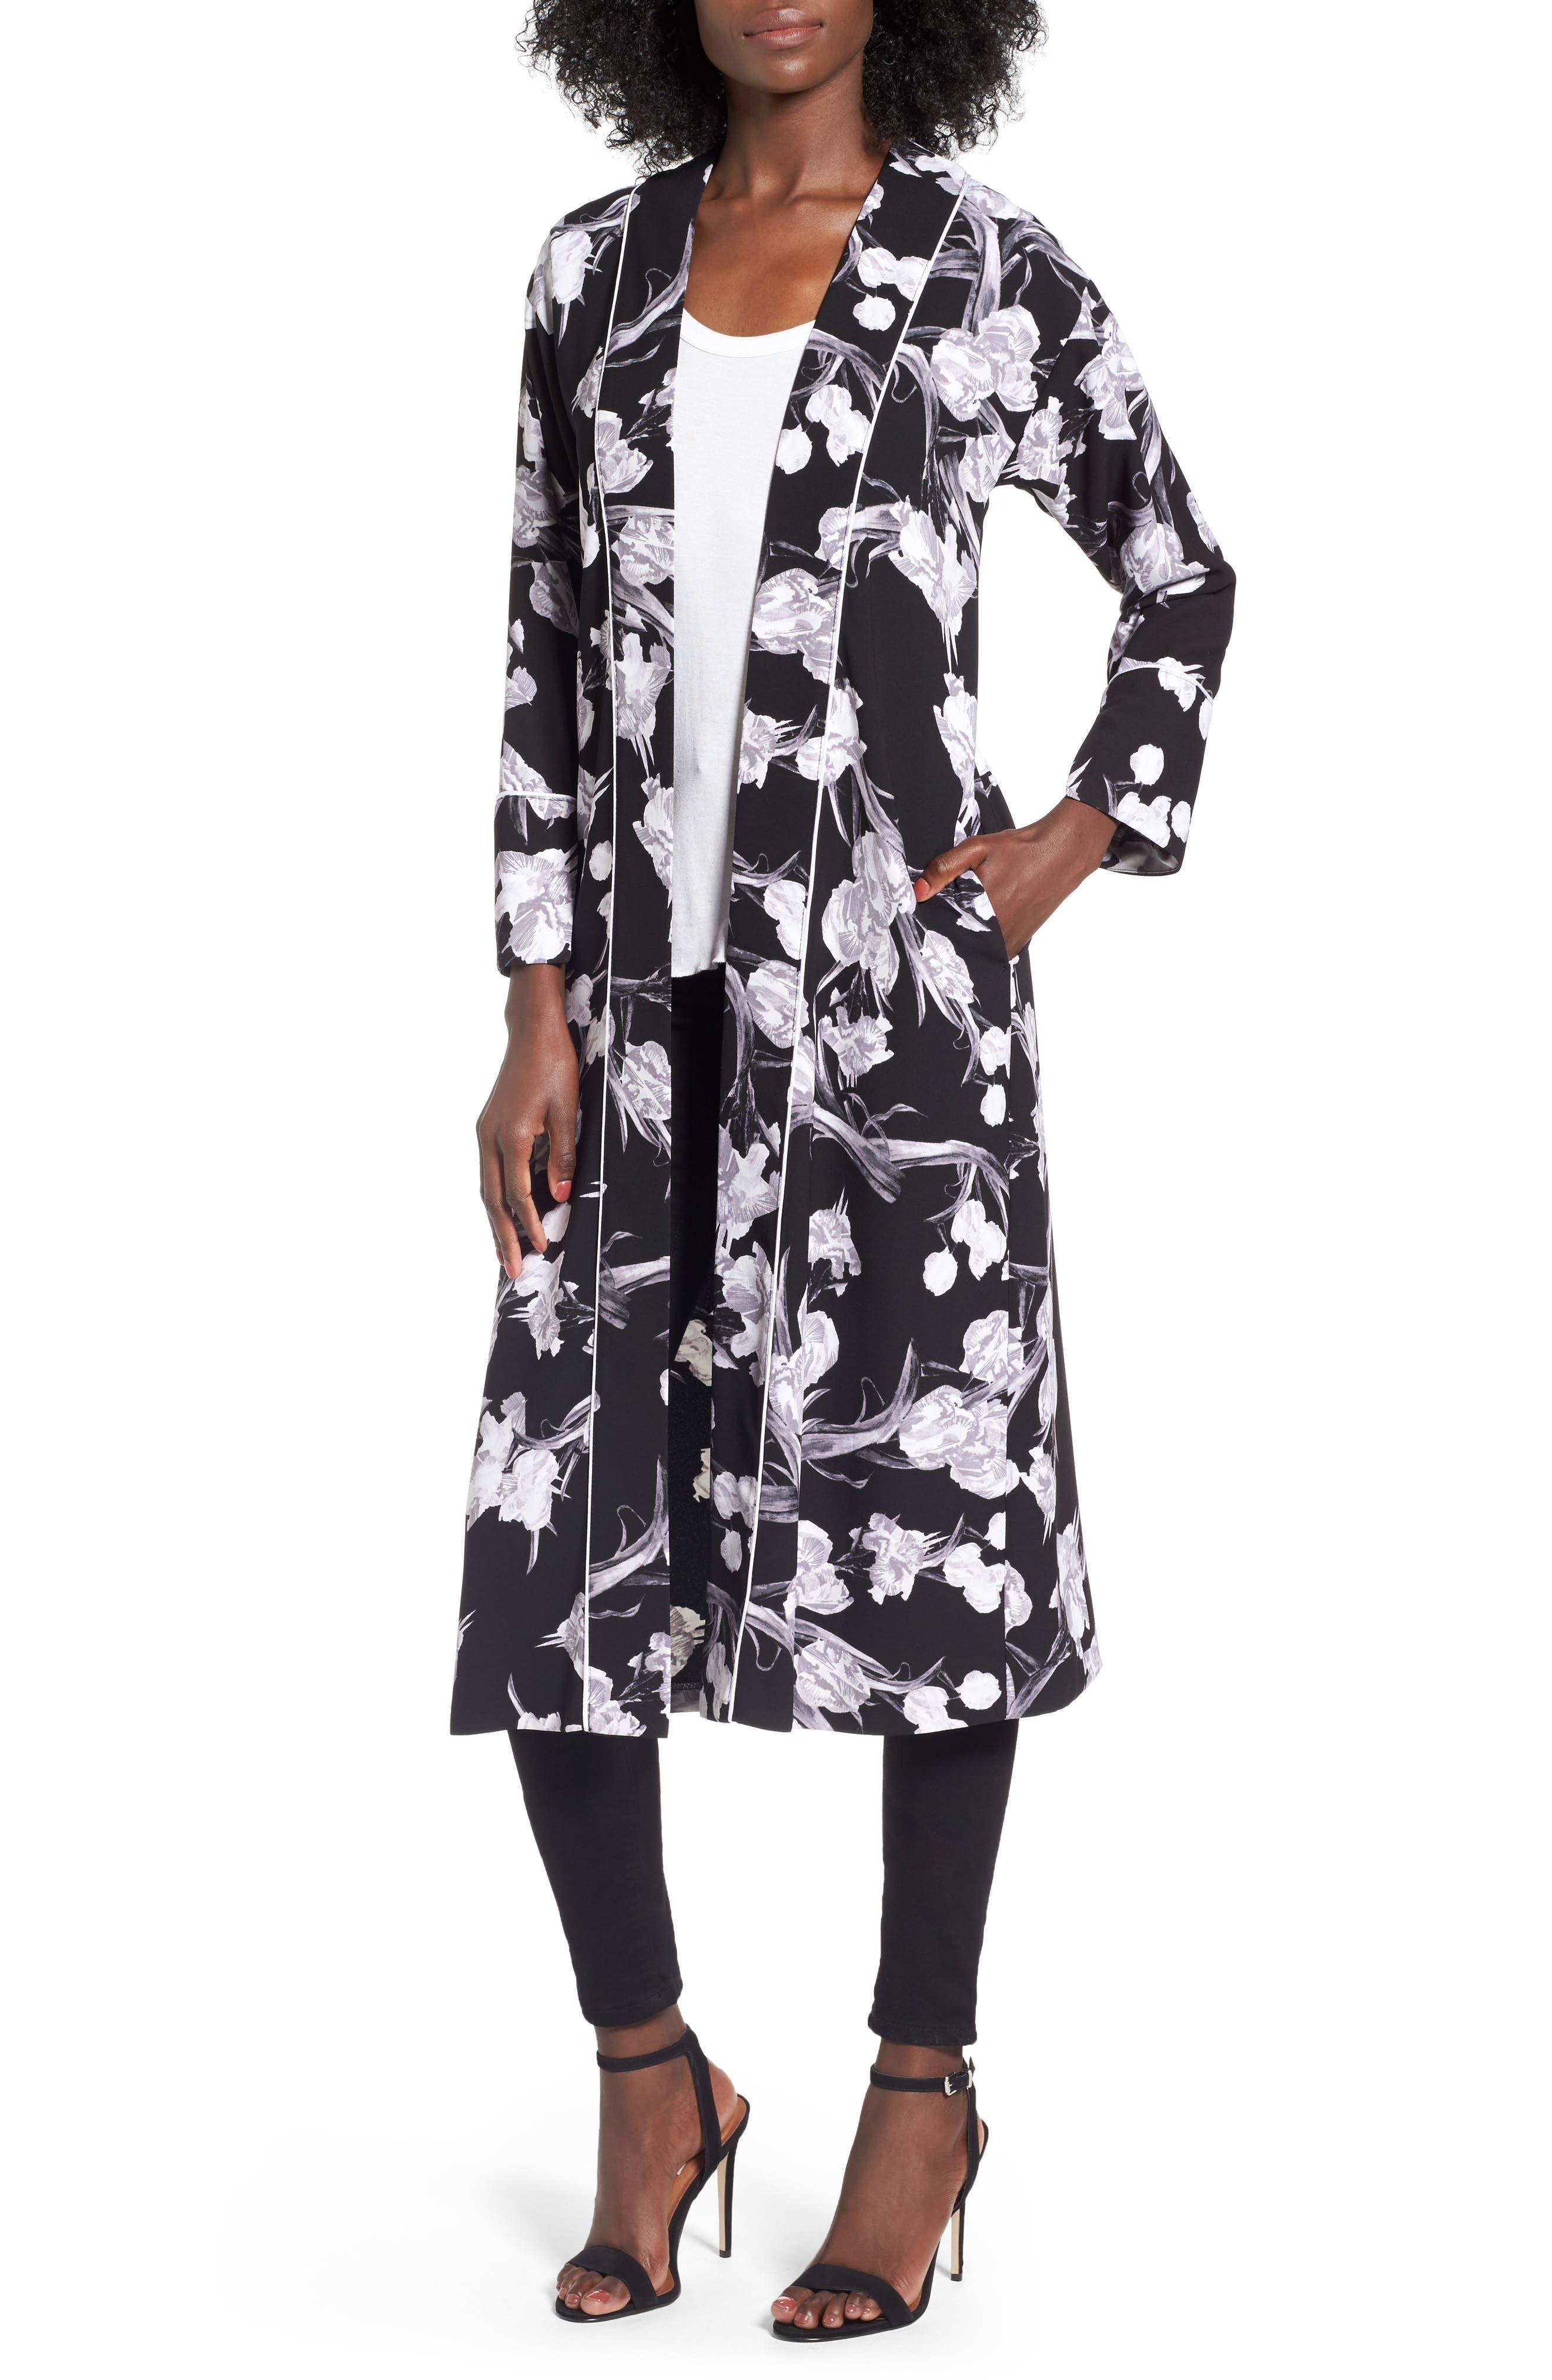 Topshop Floral Kimono Duster Jacket